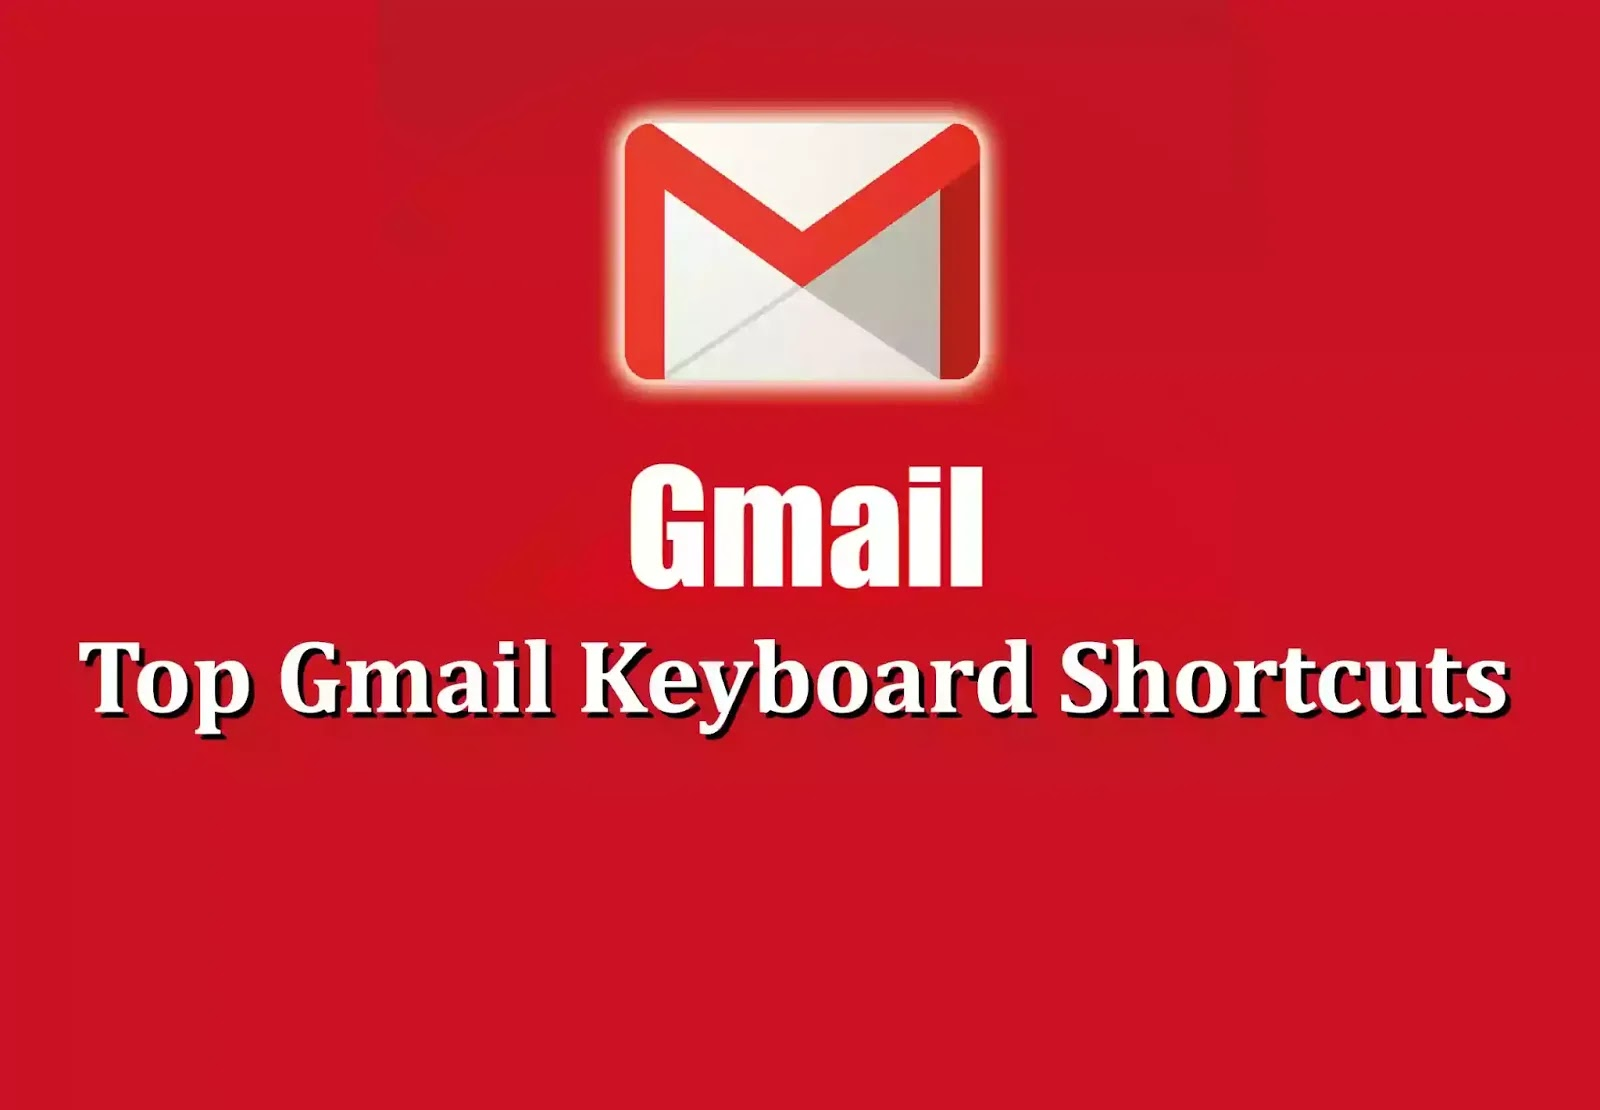 gmail keyboard shortcuts delete, gmail keyboard shortcut select message, gmail keyboard shortcut archive, gmail keyboard shortcut add label, gmail keyboard shortcut enable, keyboard shortcut for gmail